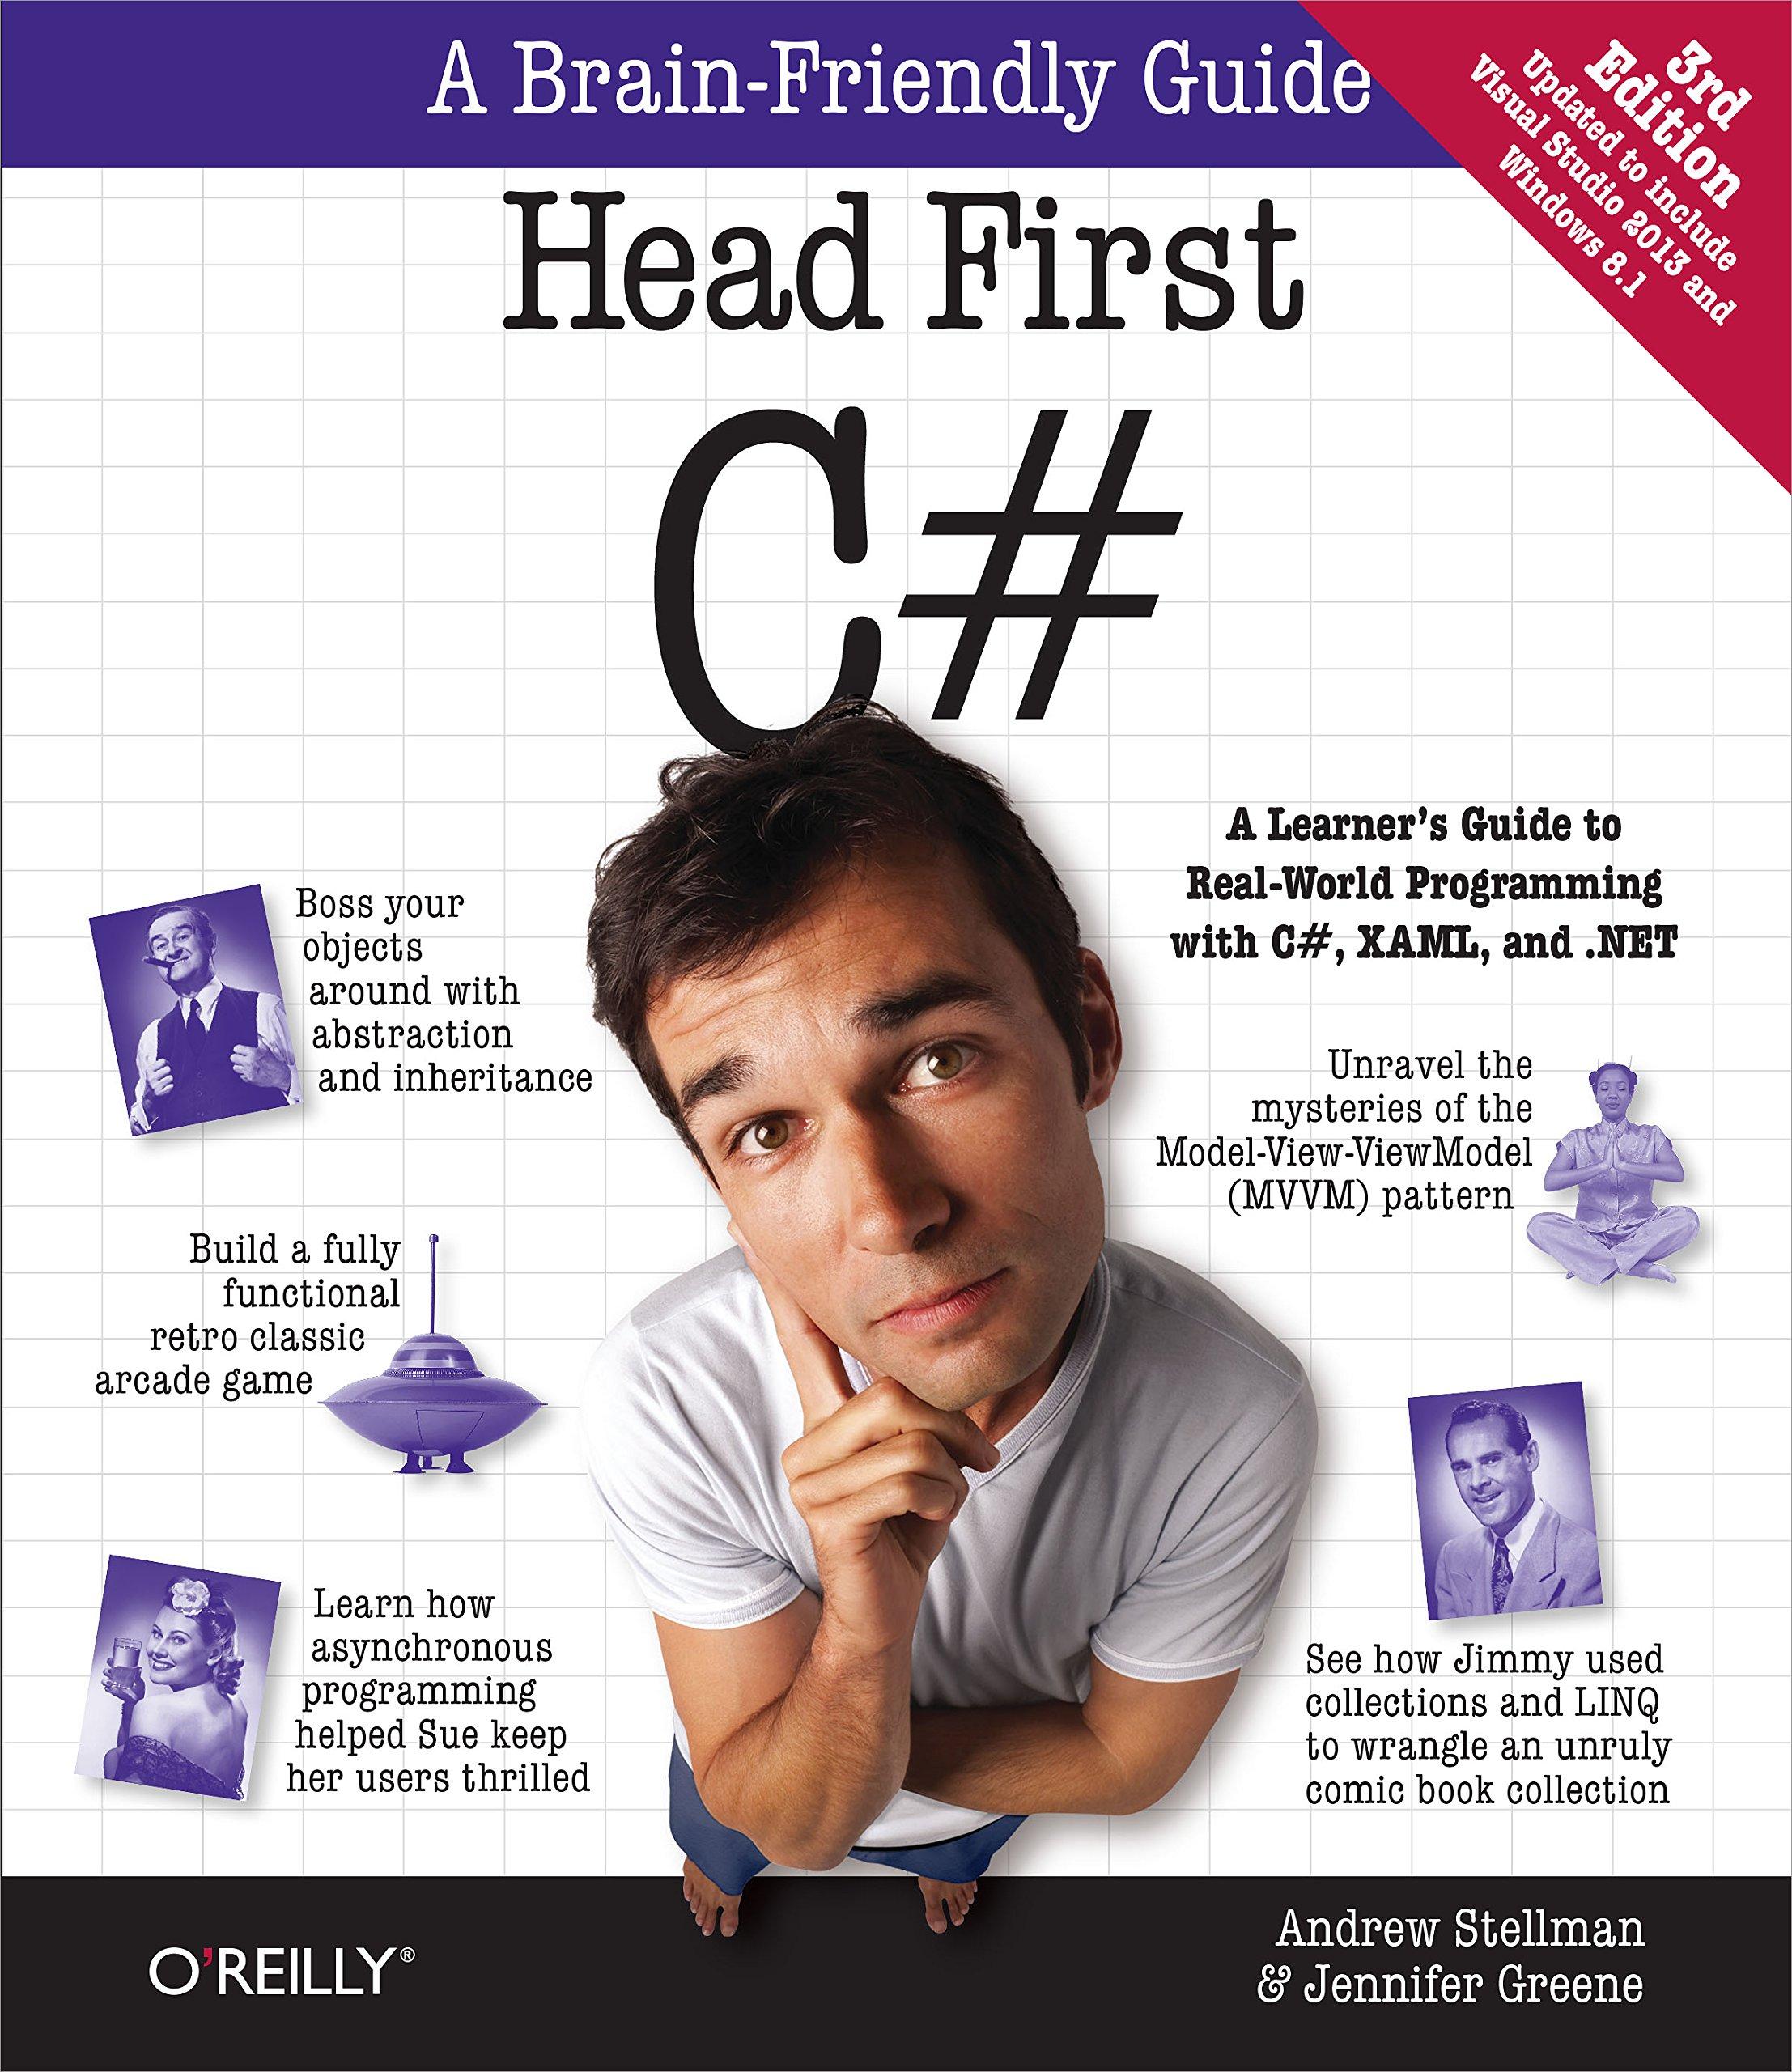 Head First C# ISBN-13 9781449343507